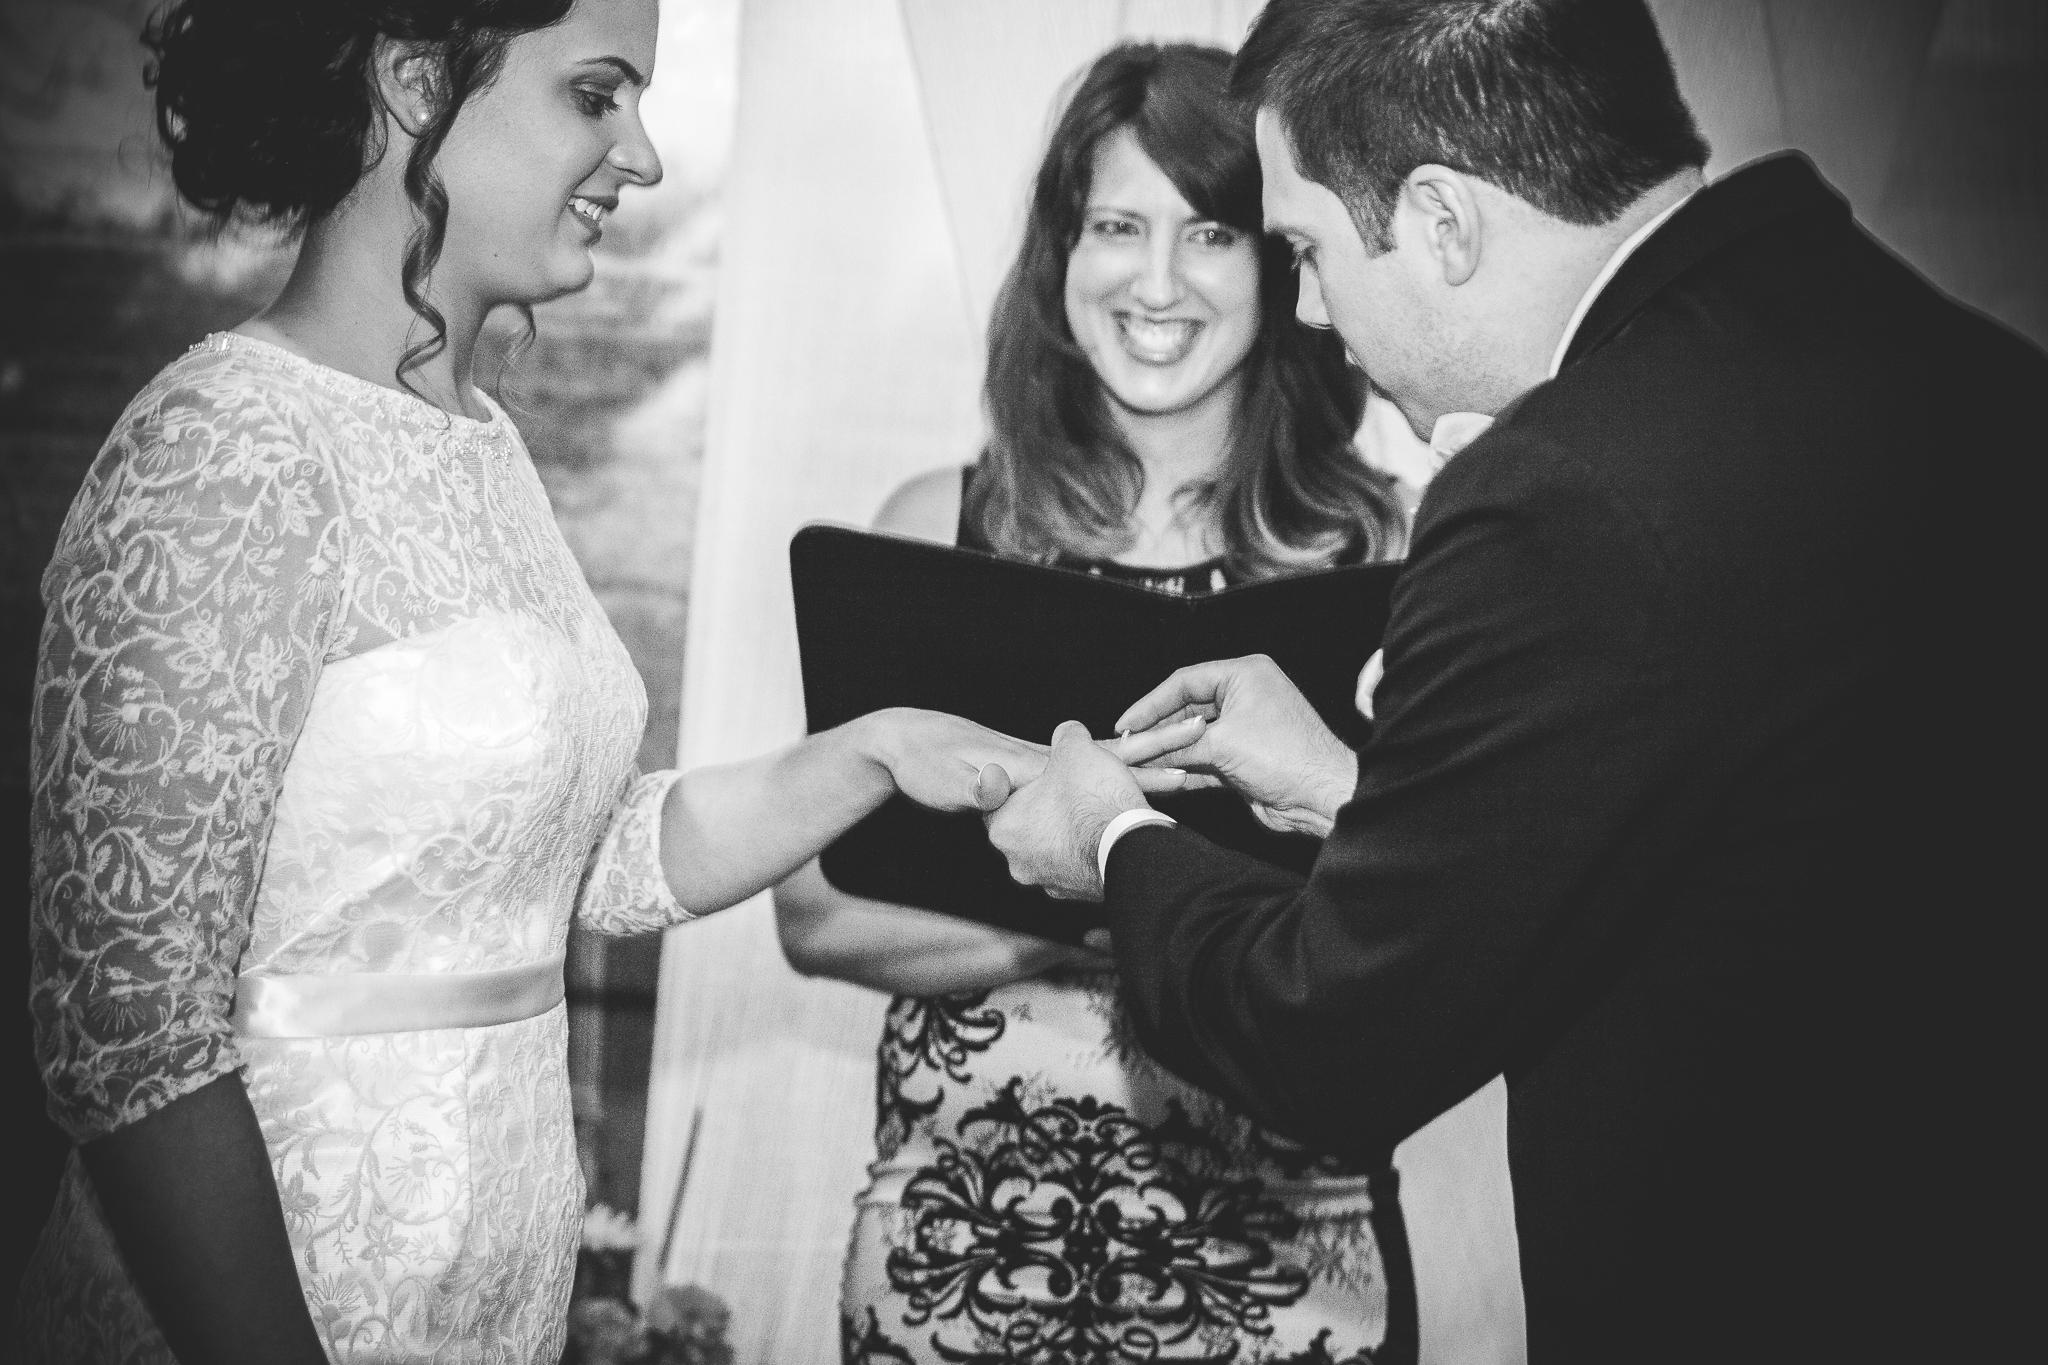 camuglia-whomstudio-chelsea_and_andy-nycphotographer-wedding-brooklyn-buffalo-timberlodge-083-0621.jpg